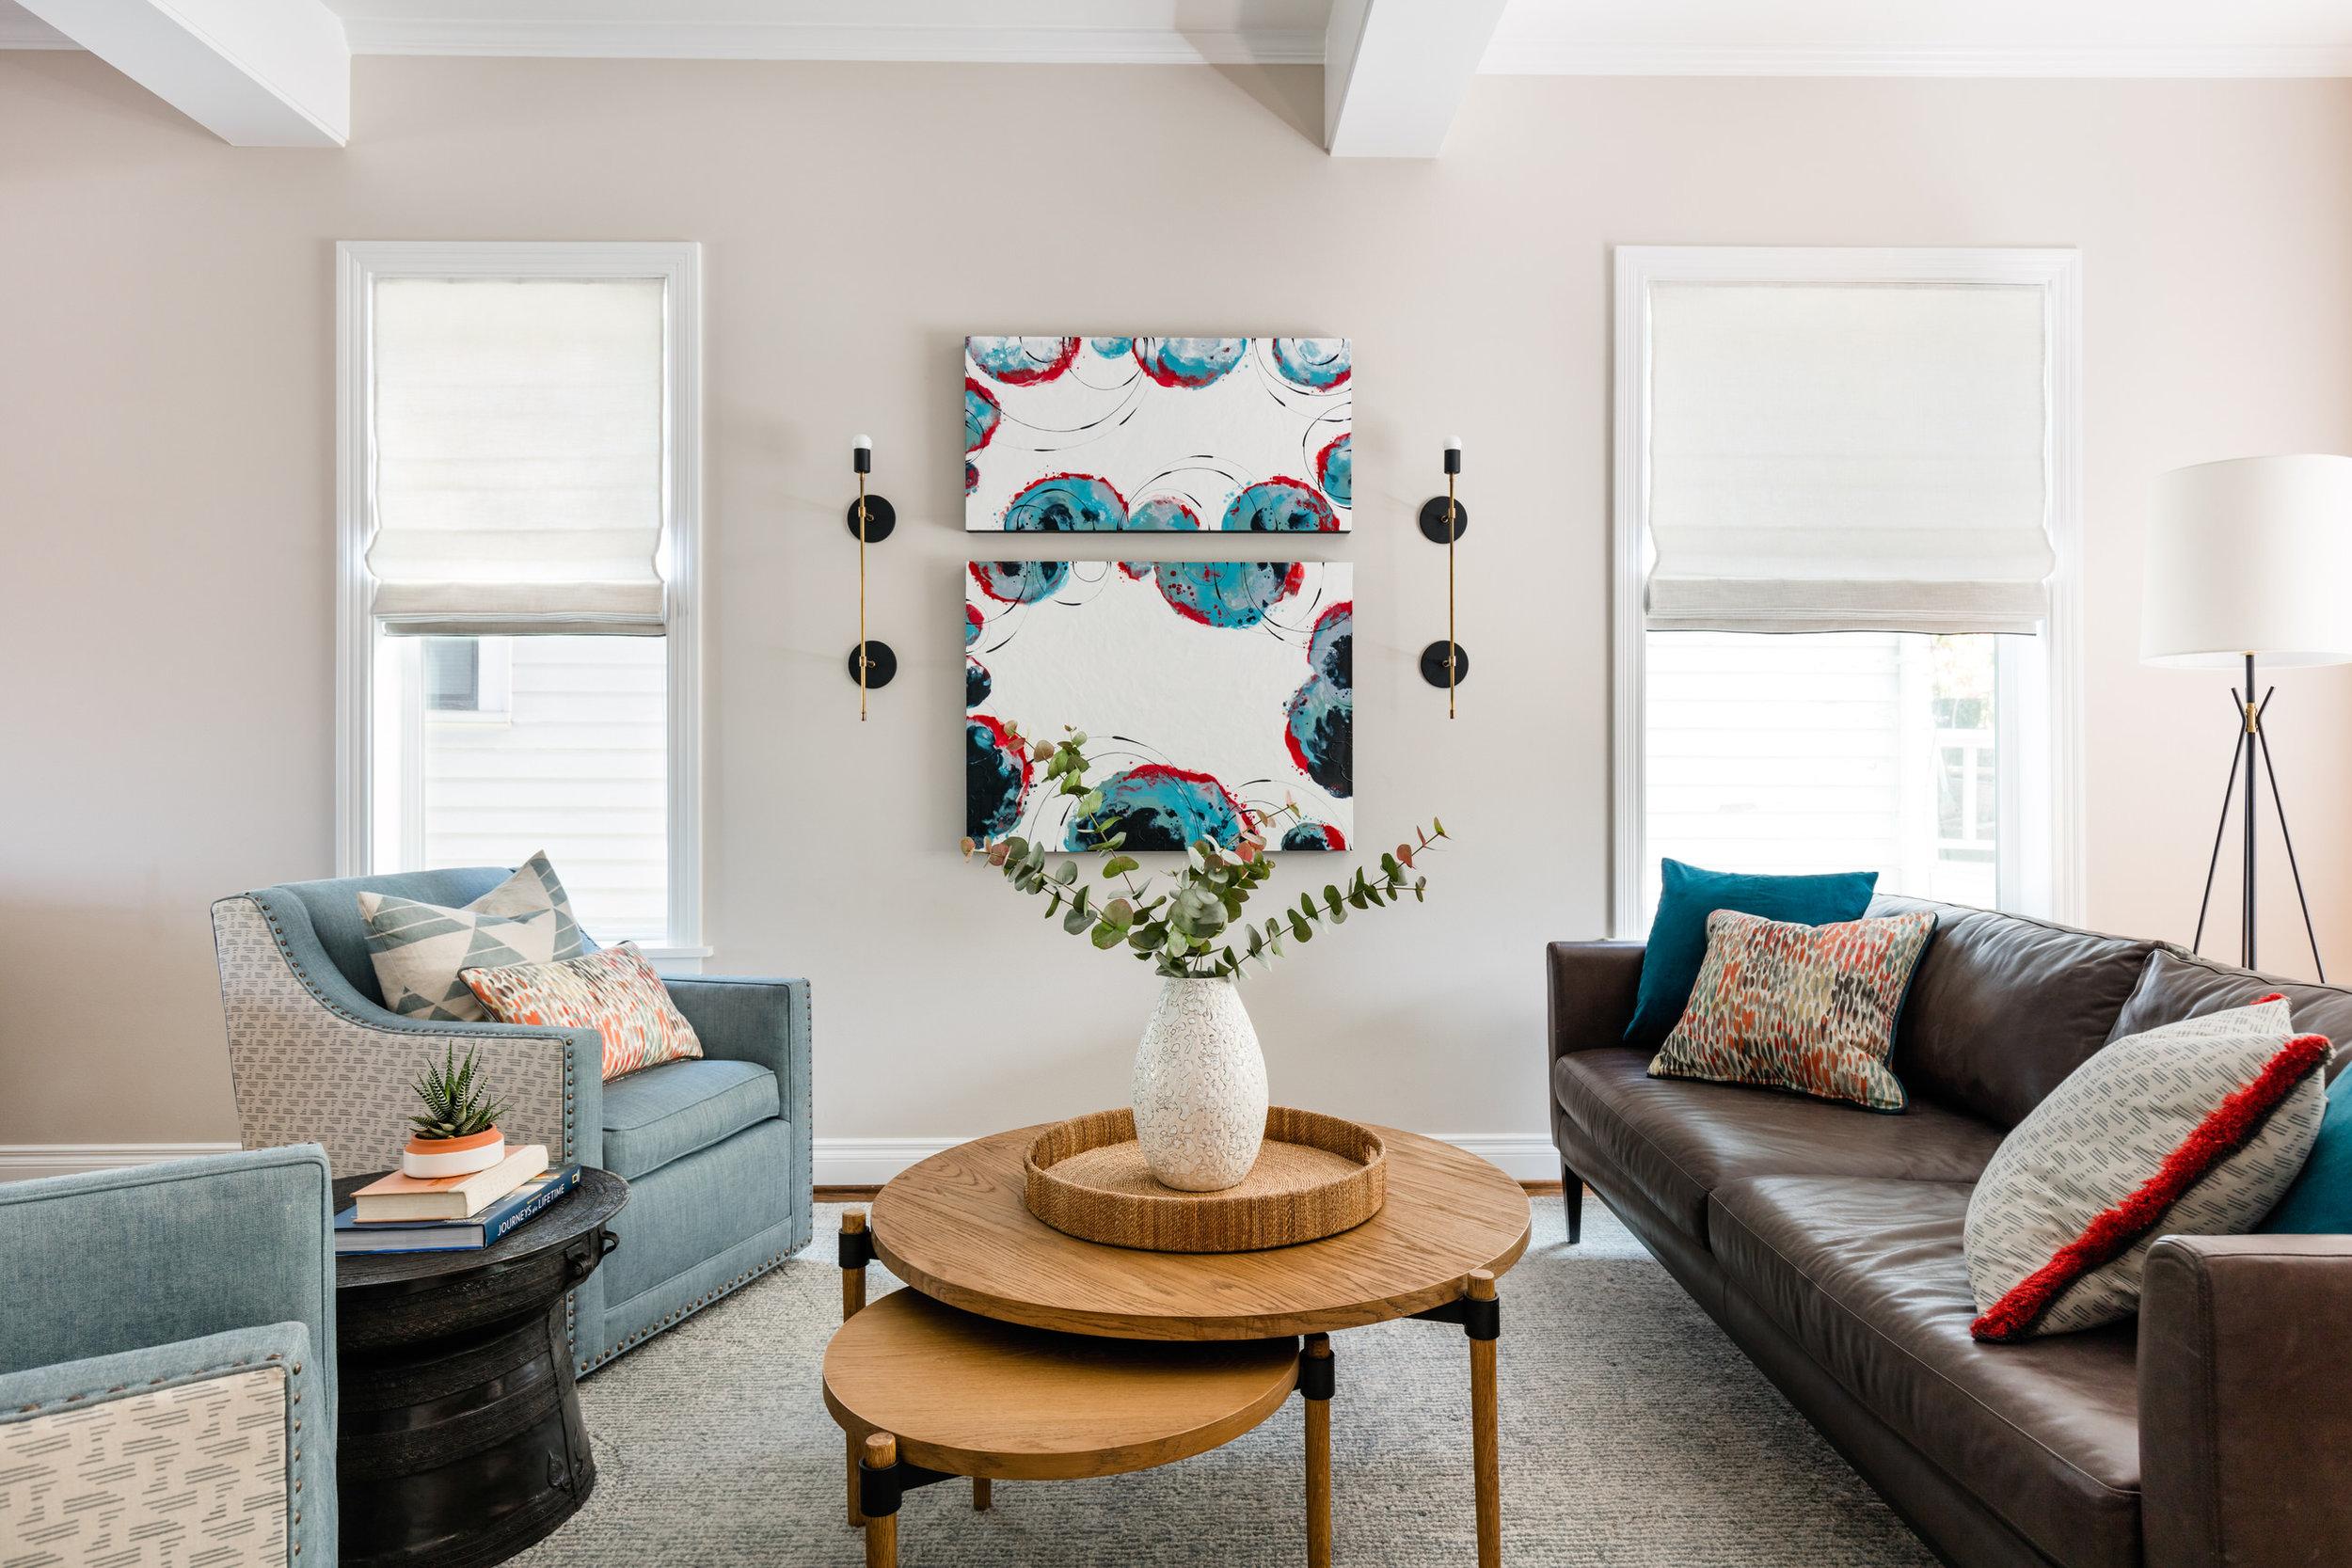 0002-Miranda-Estes-Photography-The-Residency-Bureau-Wallingford-20190515.jpg